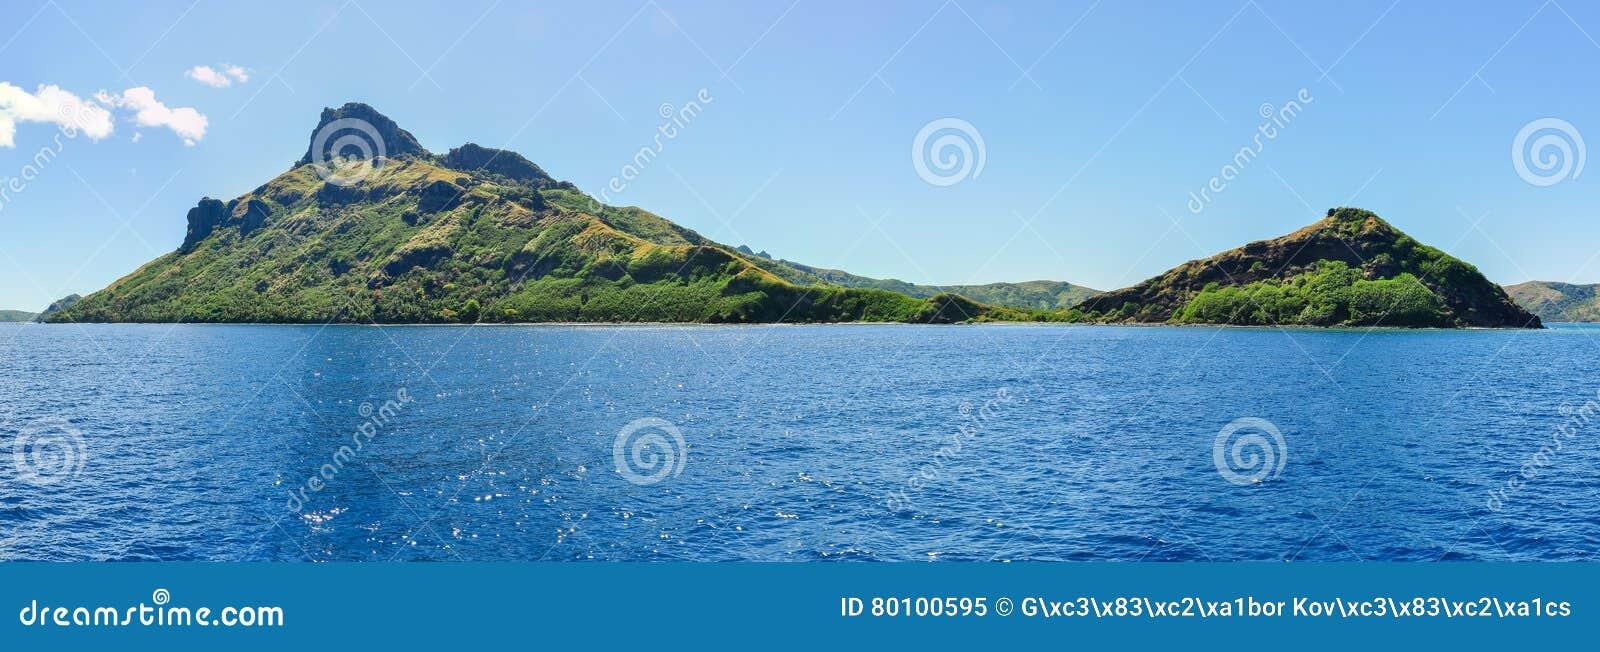 Vista da ilha de Waya Lailai em Fiji